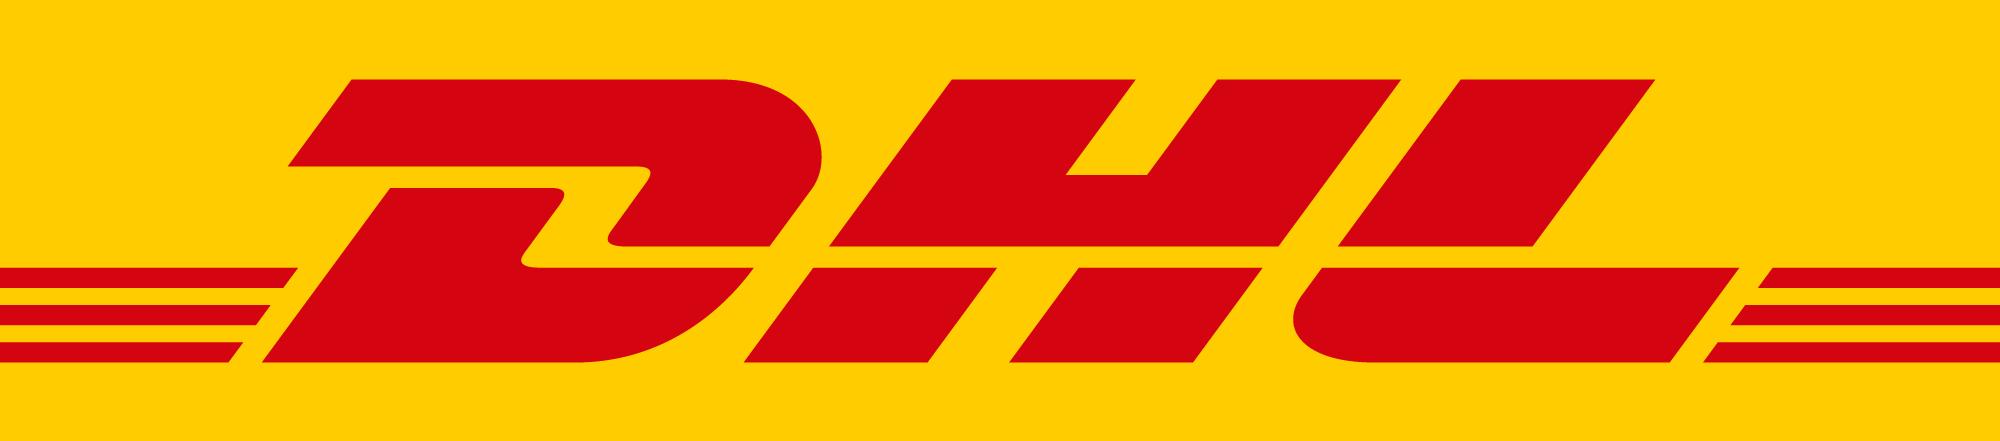 DHL_logo_rgb-1